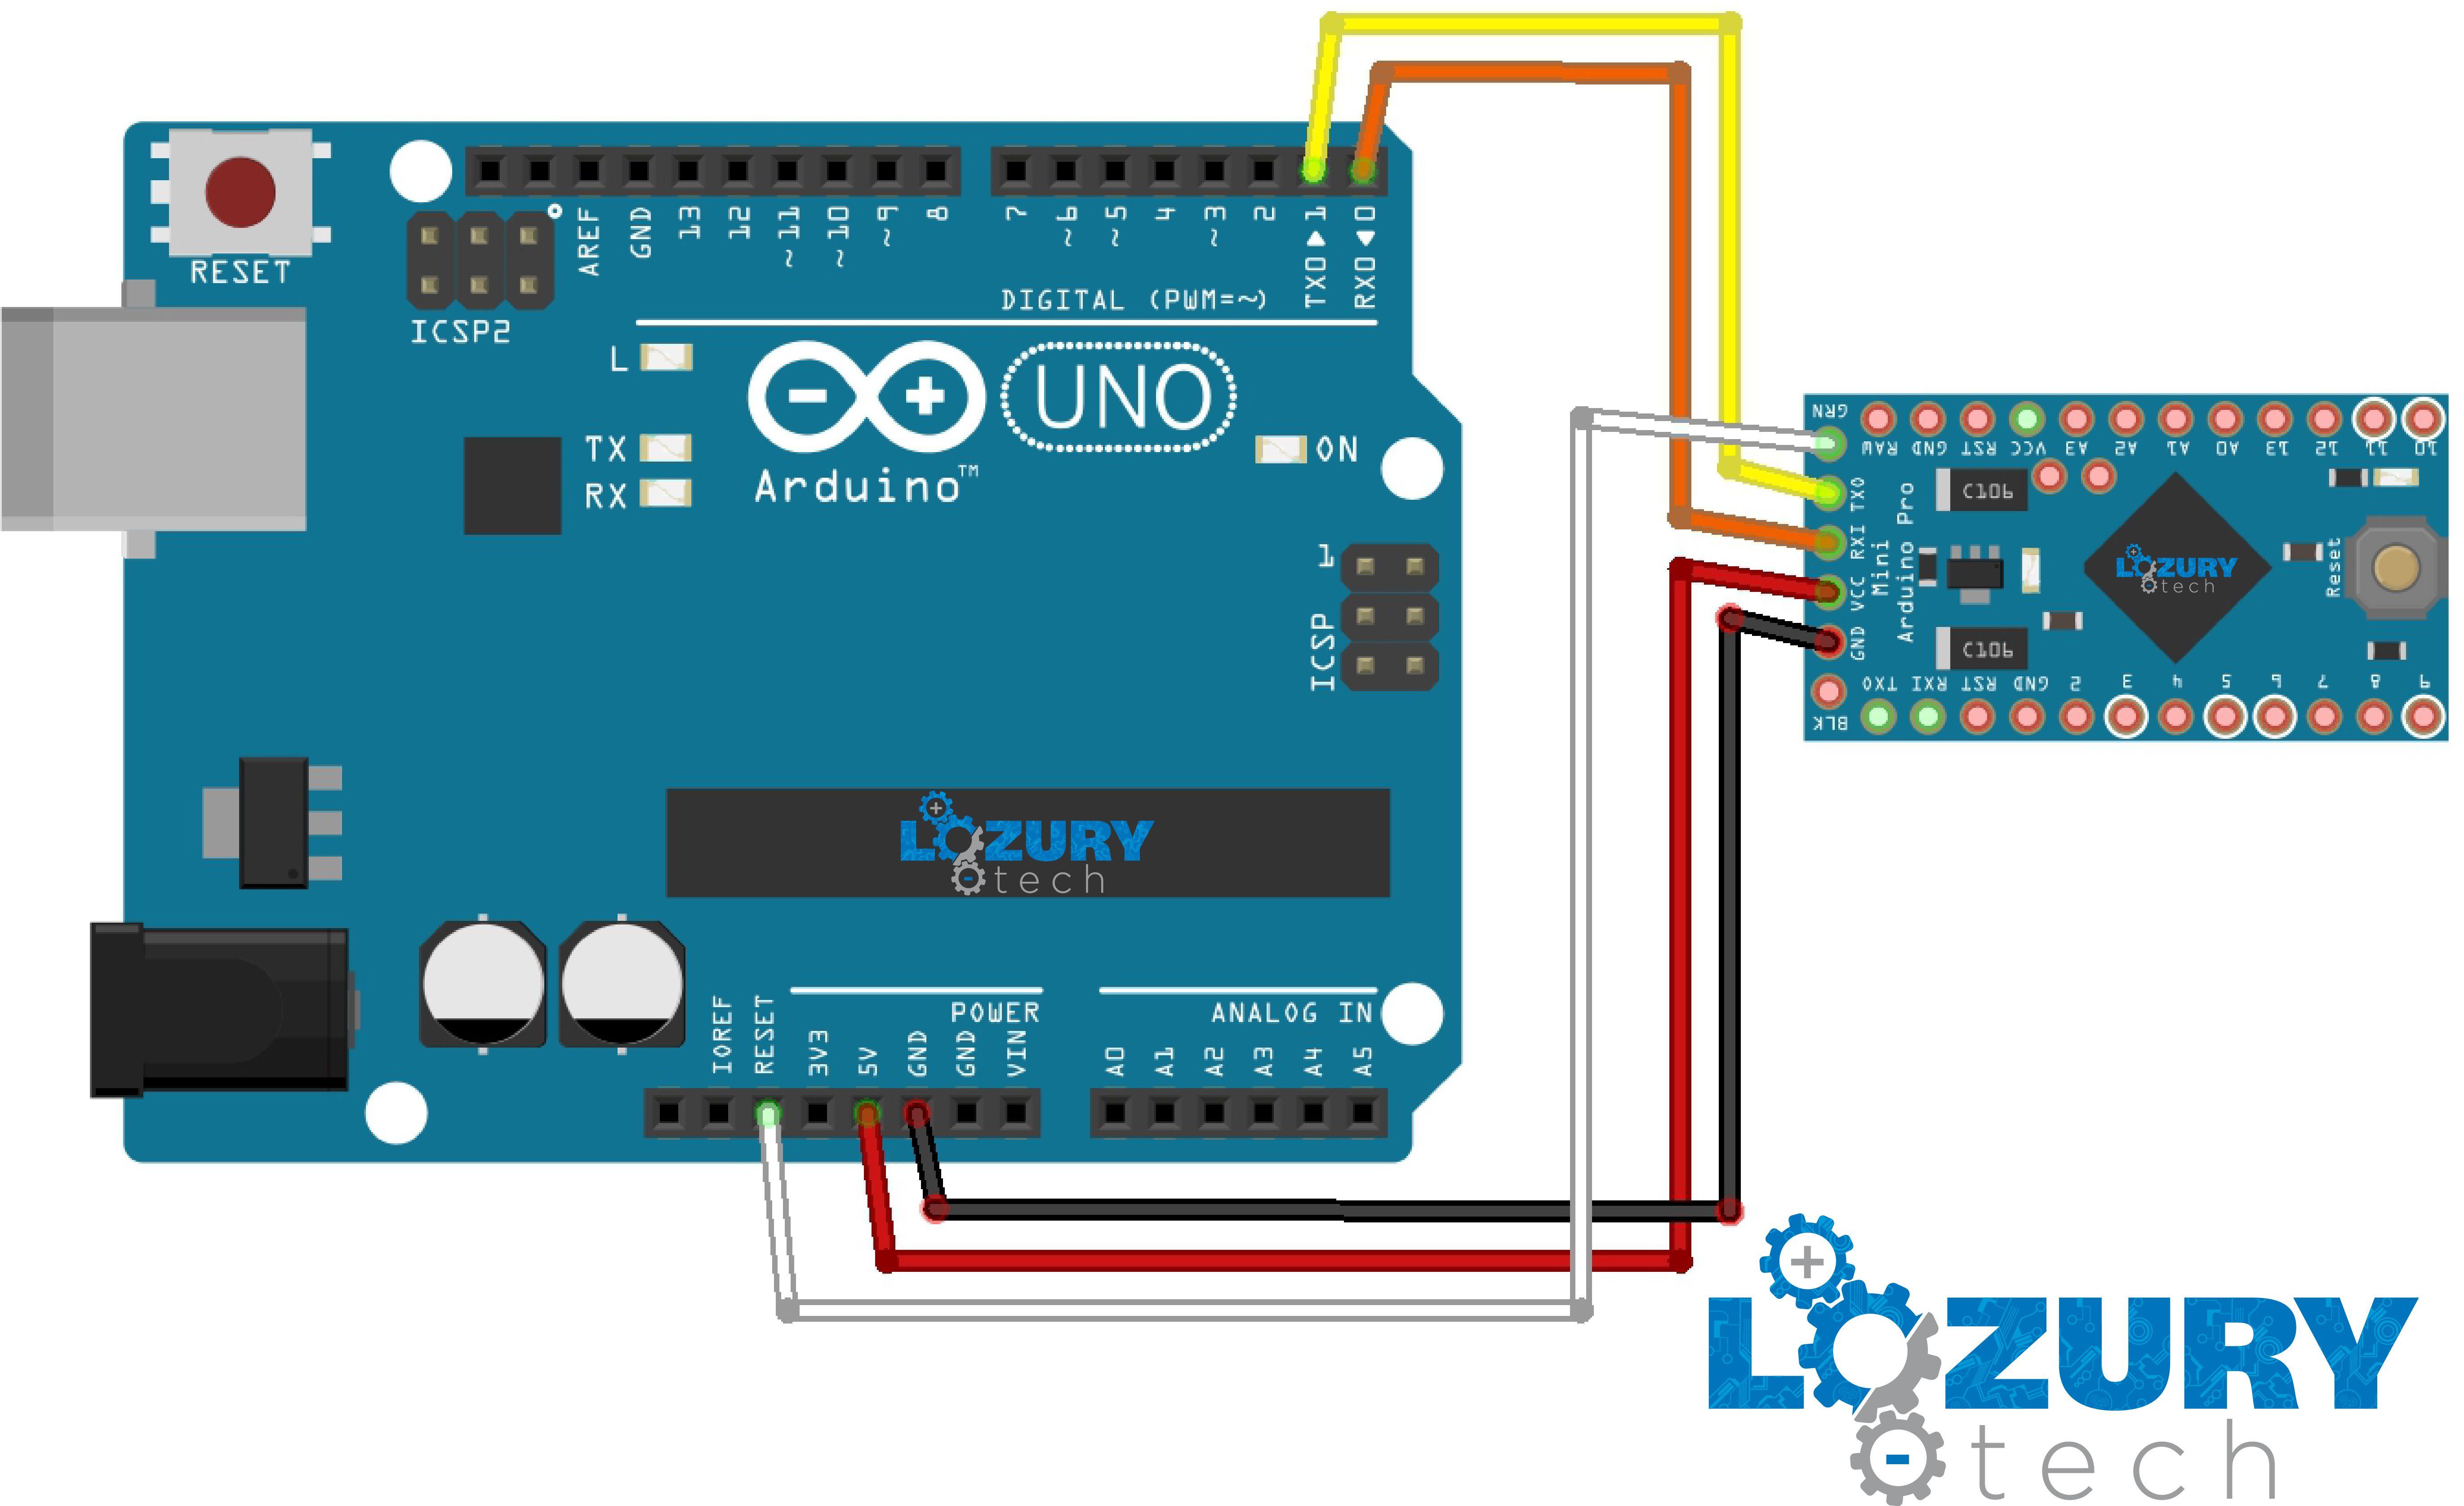 Como Programar Arduino Pro Mini Con Uno Sensor Circuits Archives Page 2 Of Gadgetronicx Robot Light House Tents